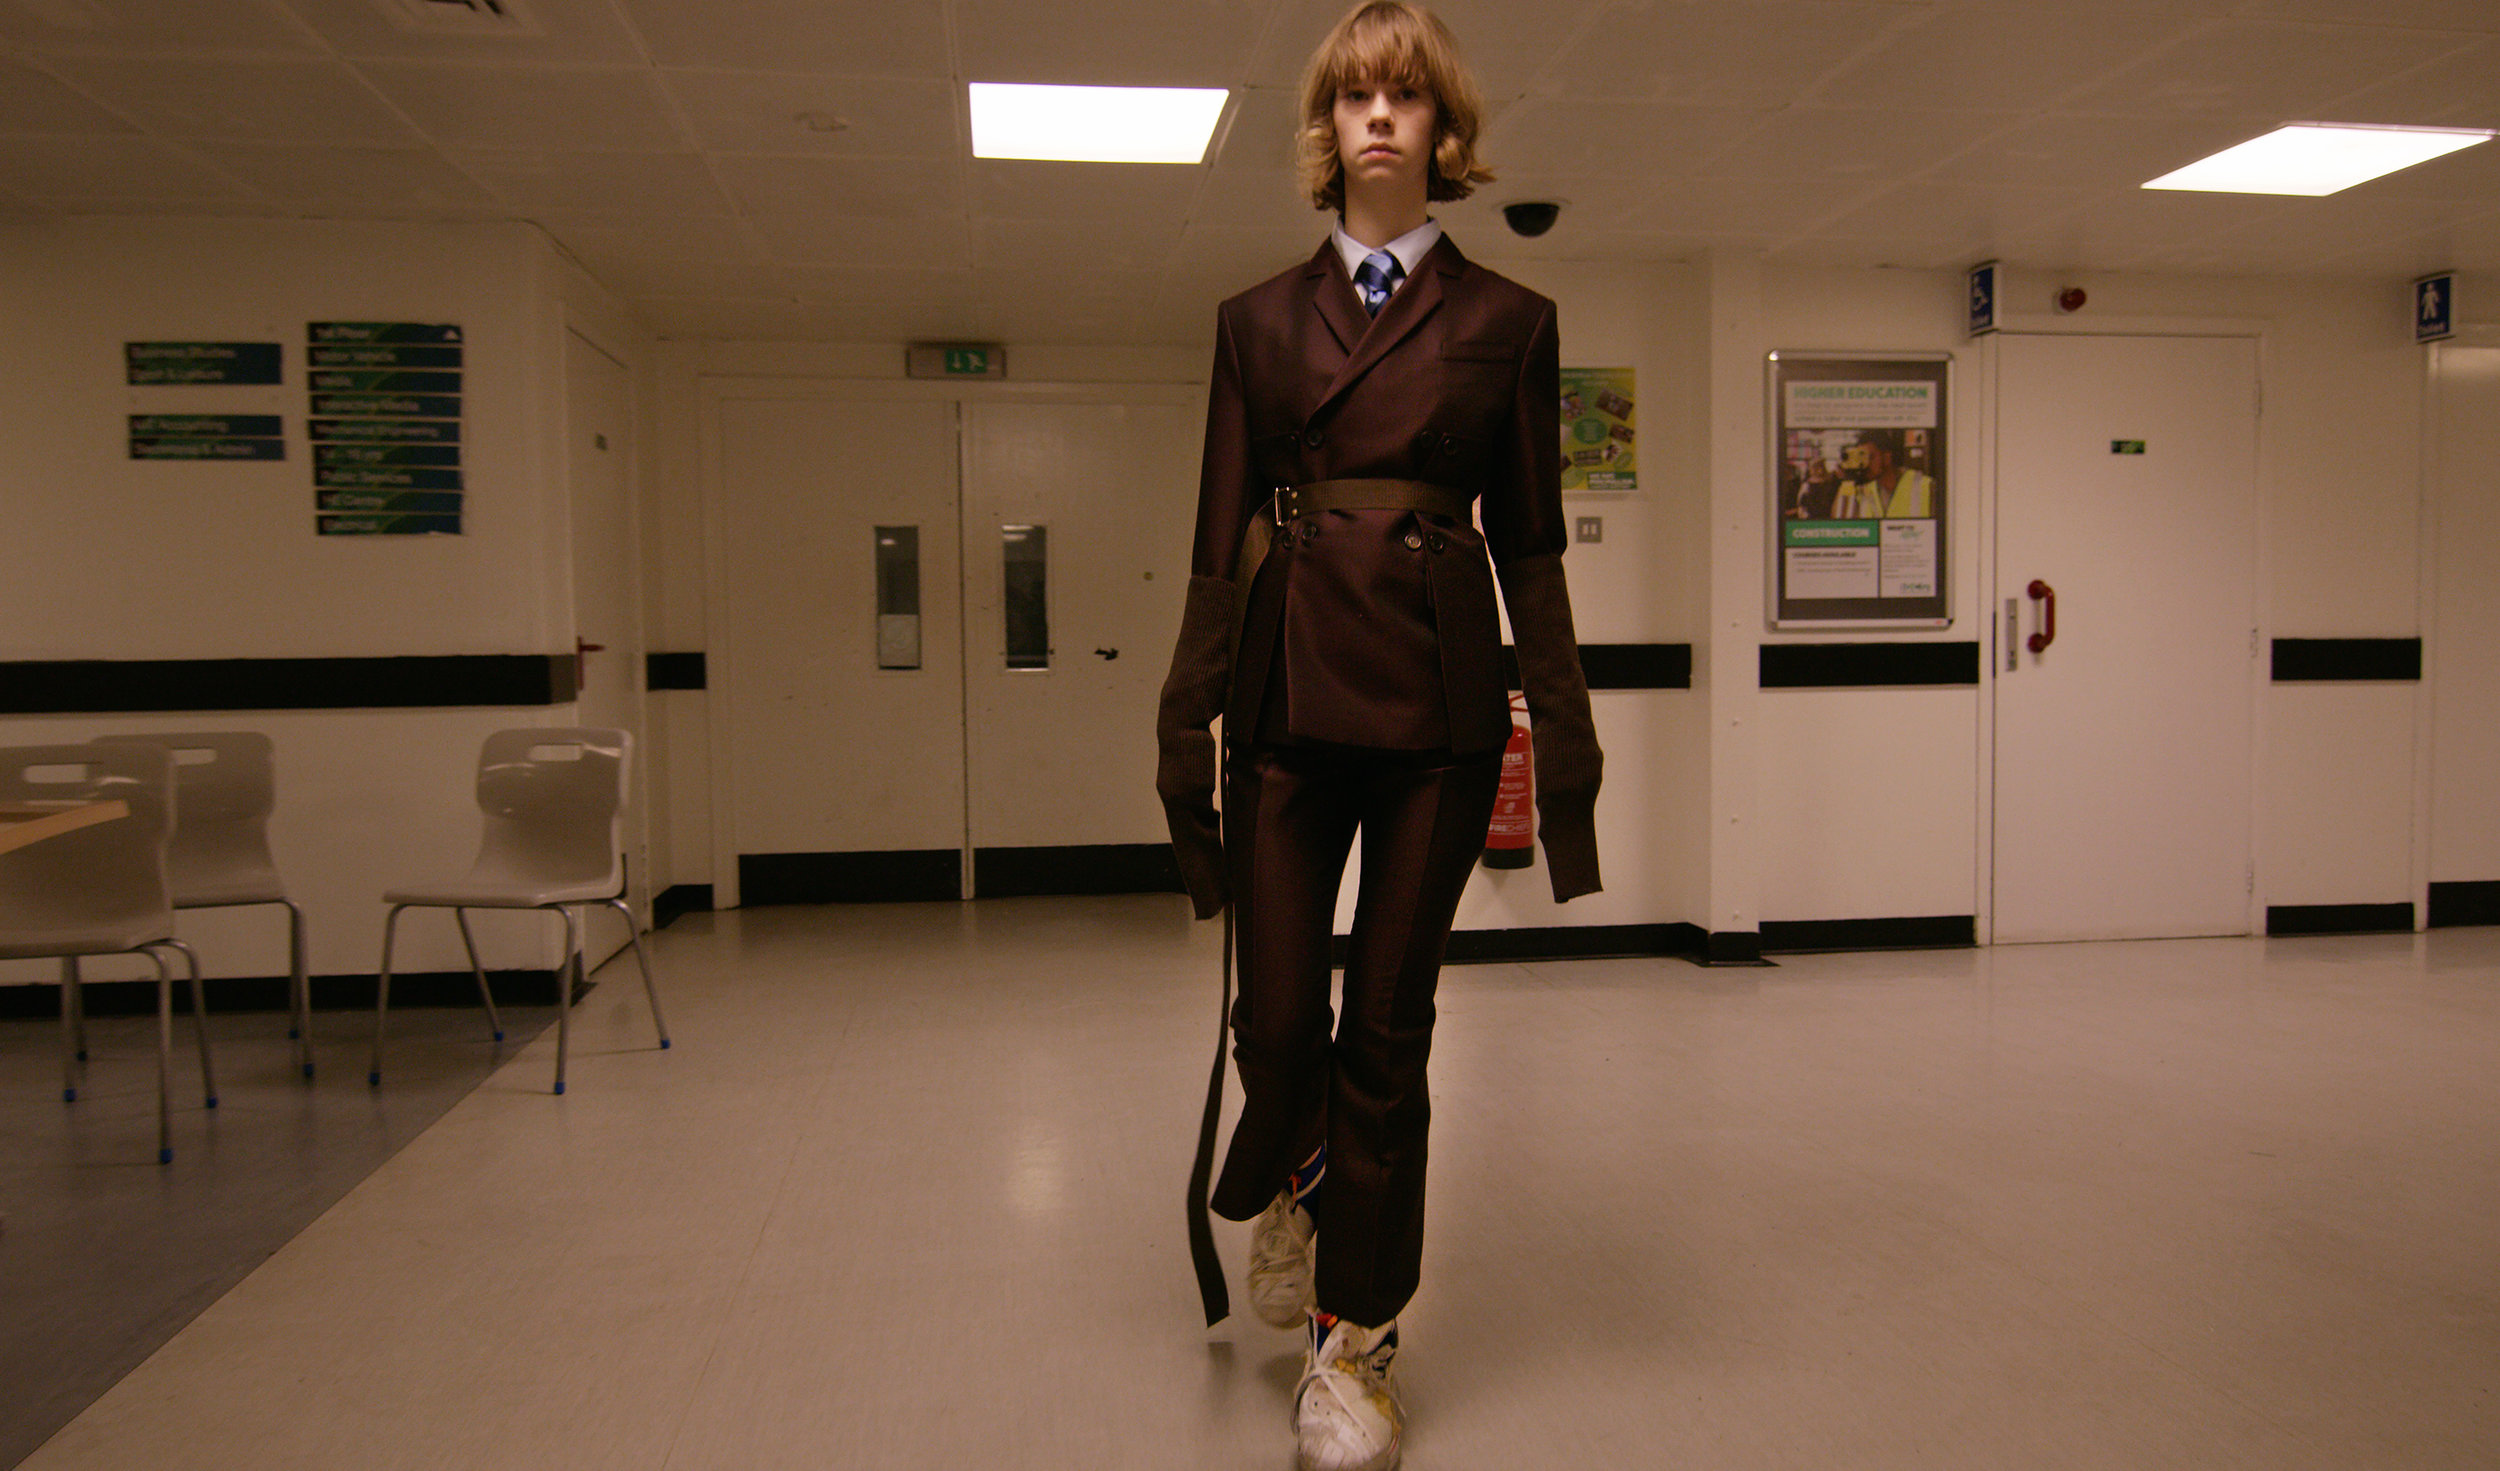 rokh_aw17_fashion_collection_magazine_01.jpg